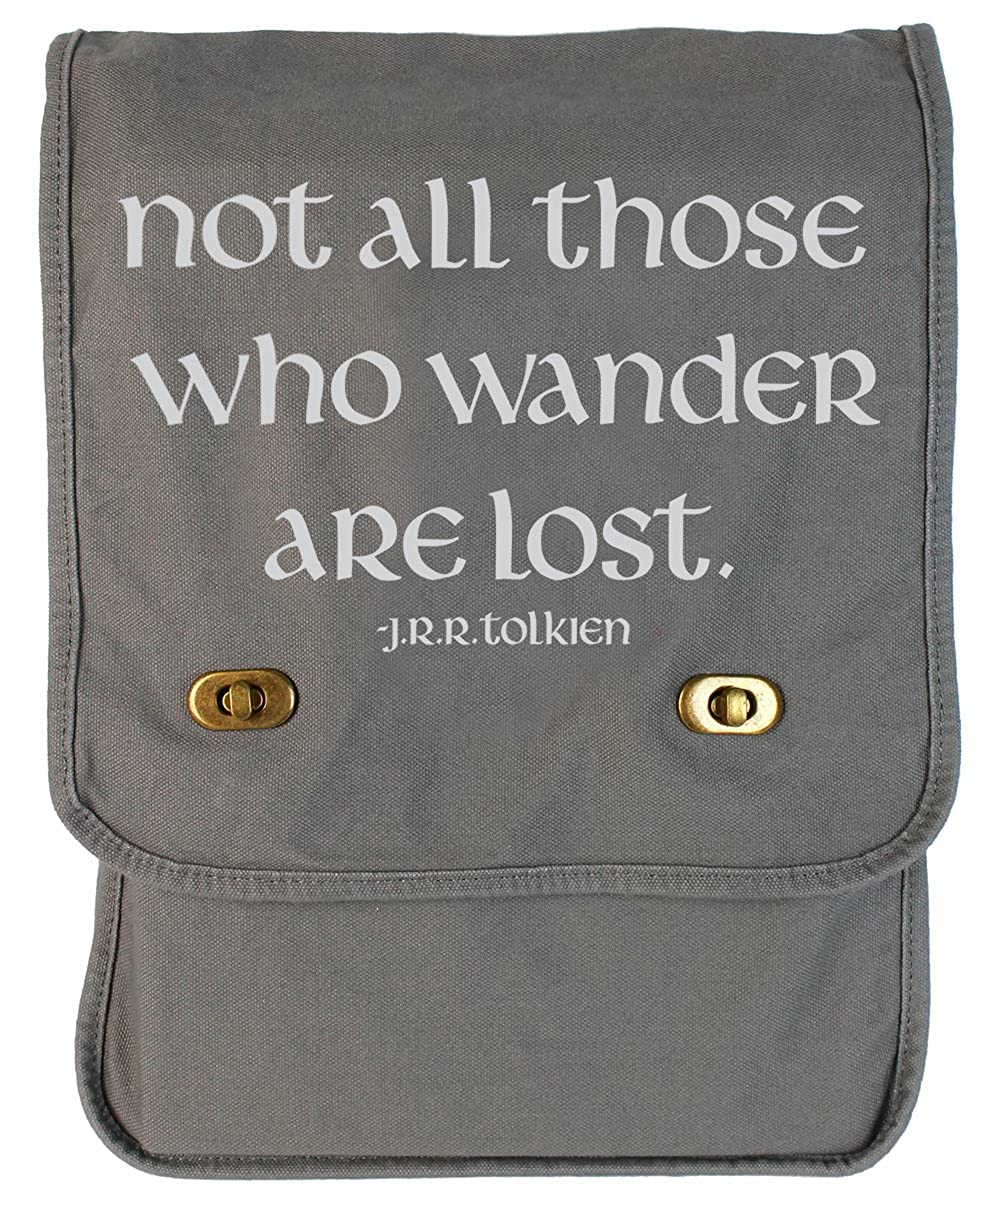 tenacitee Not All Those Who Wanderキャンバスフィールドバッグ One Size スモーク B0736G4BBR